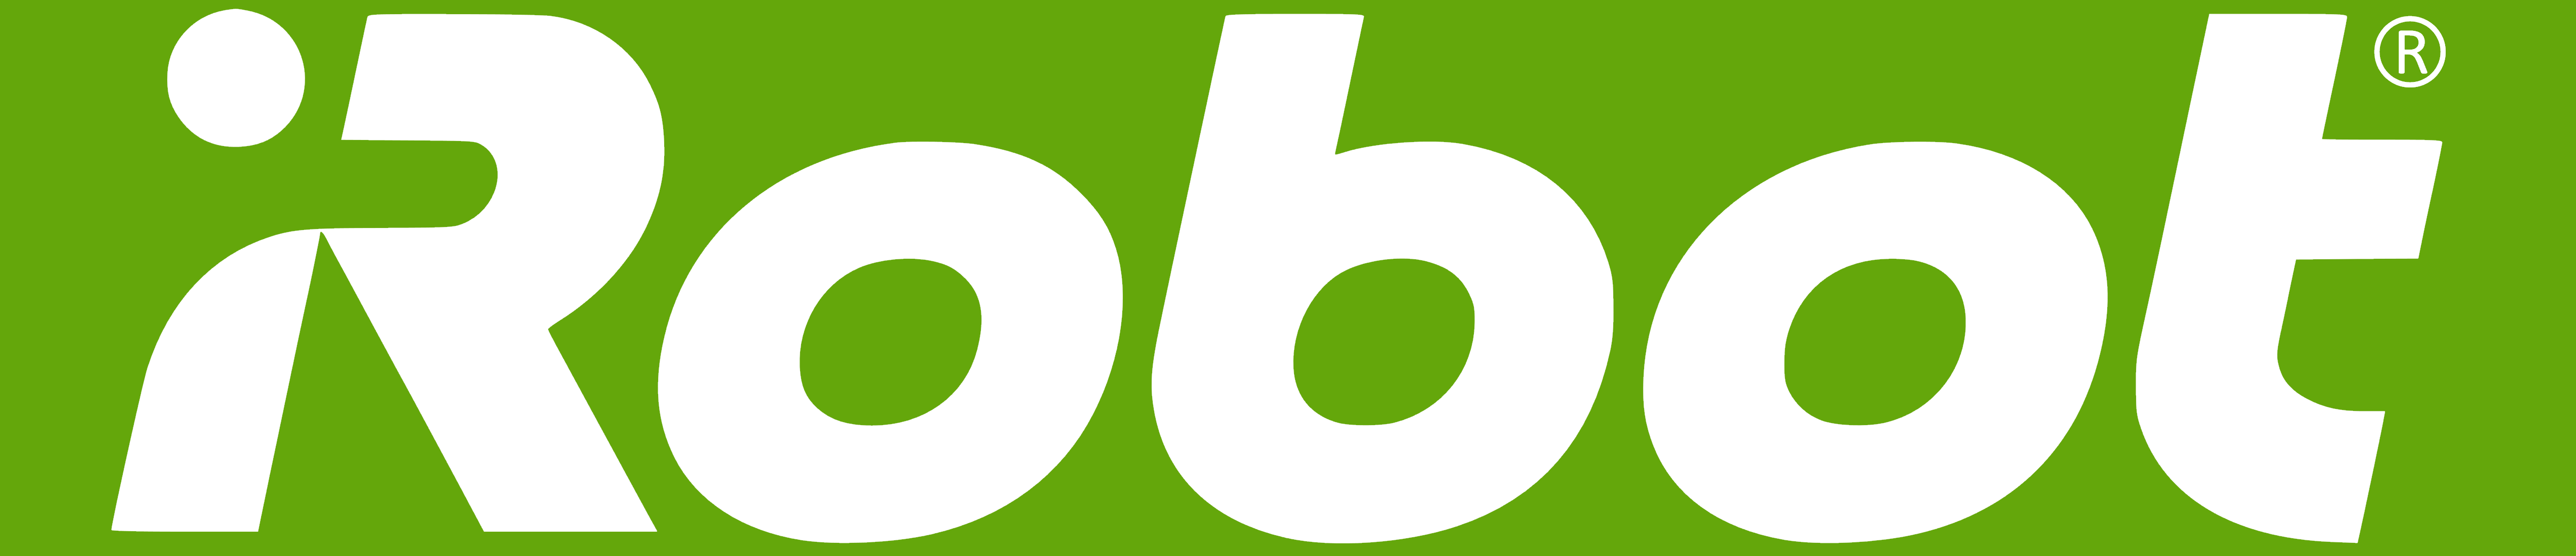 Irobot logo clipart free download iRobot – Logos Download free download